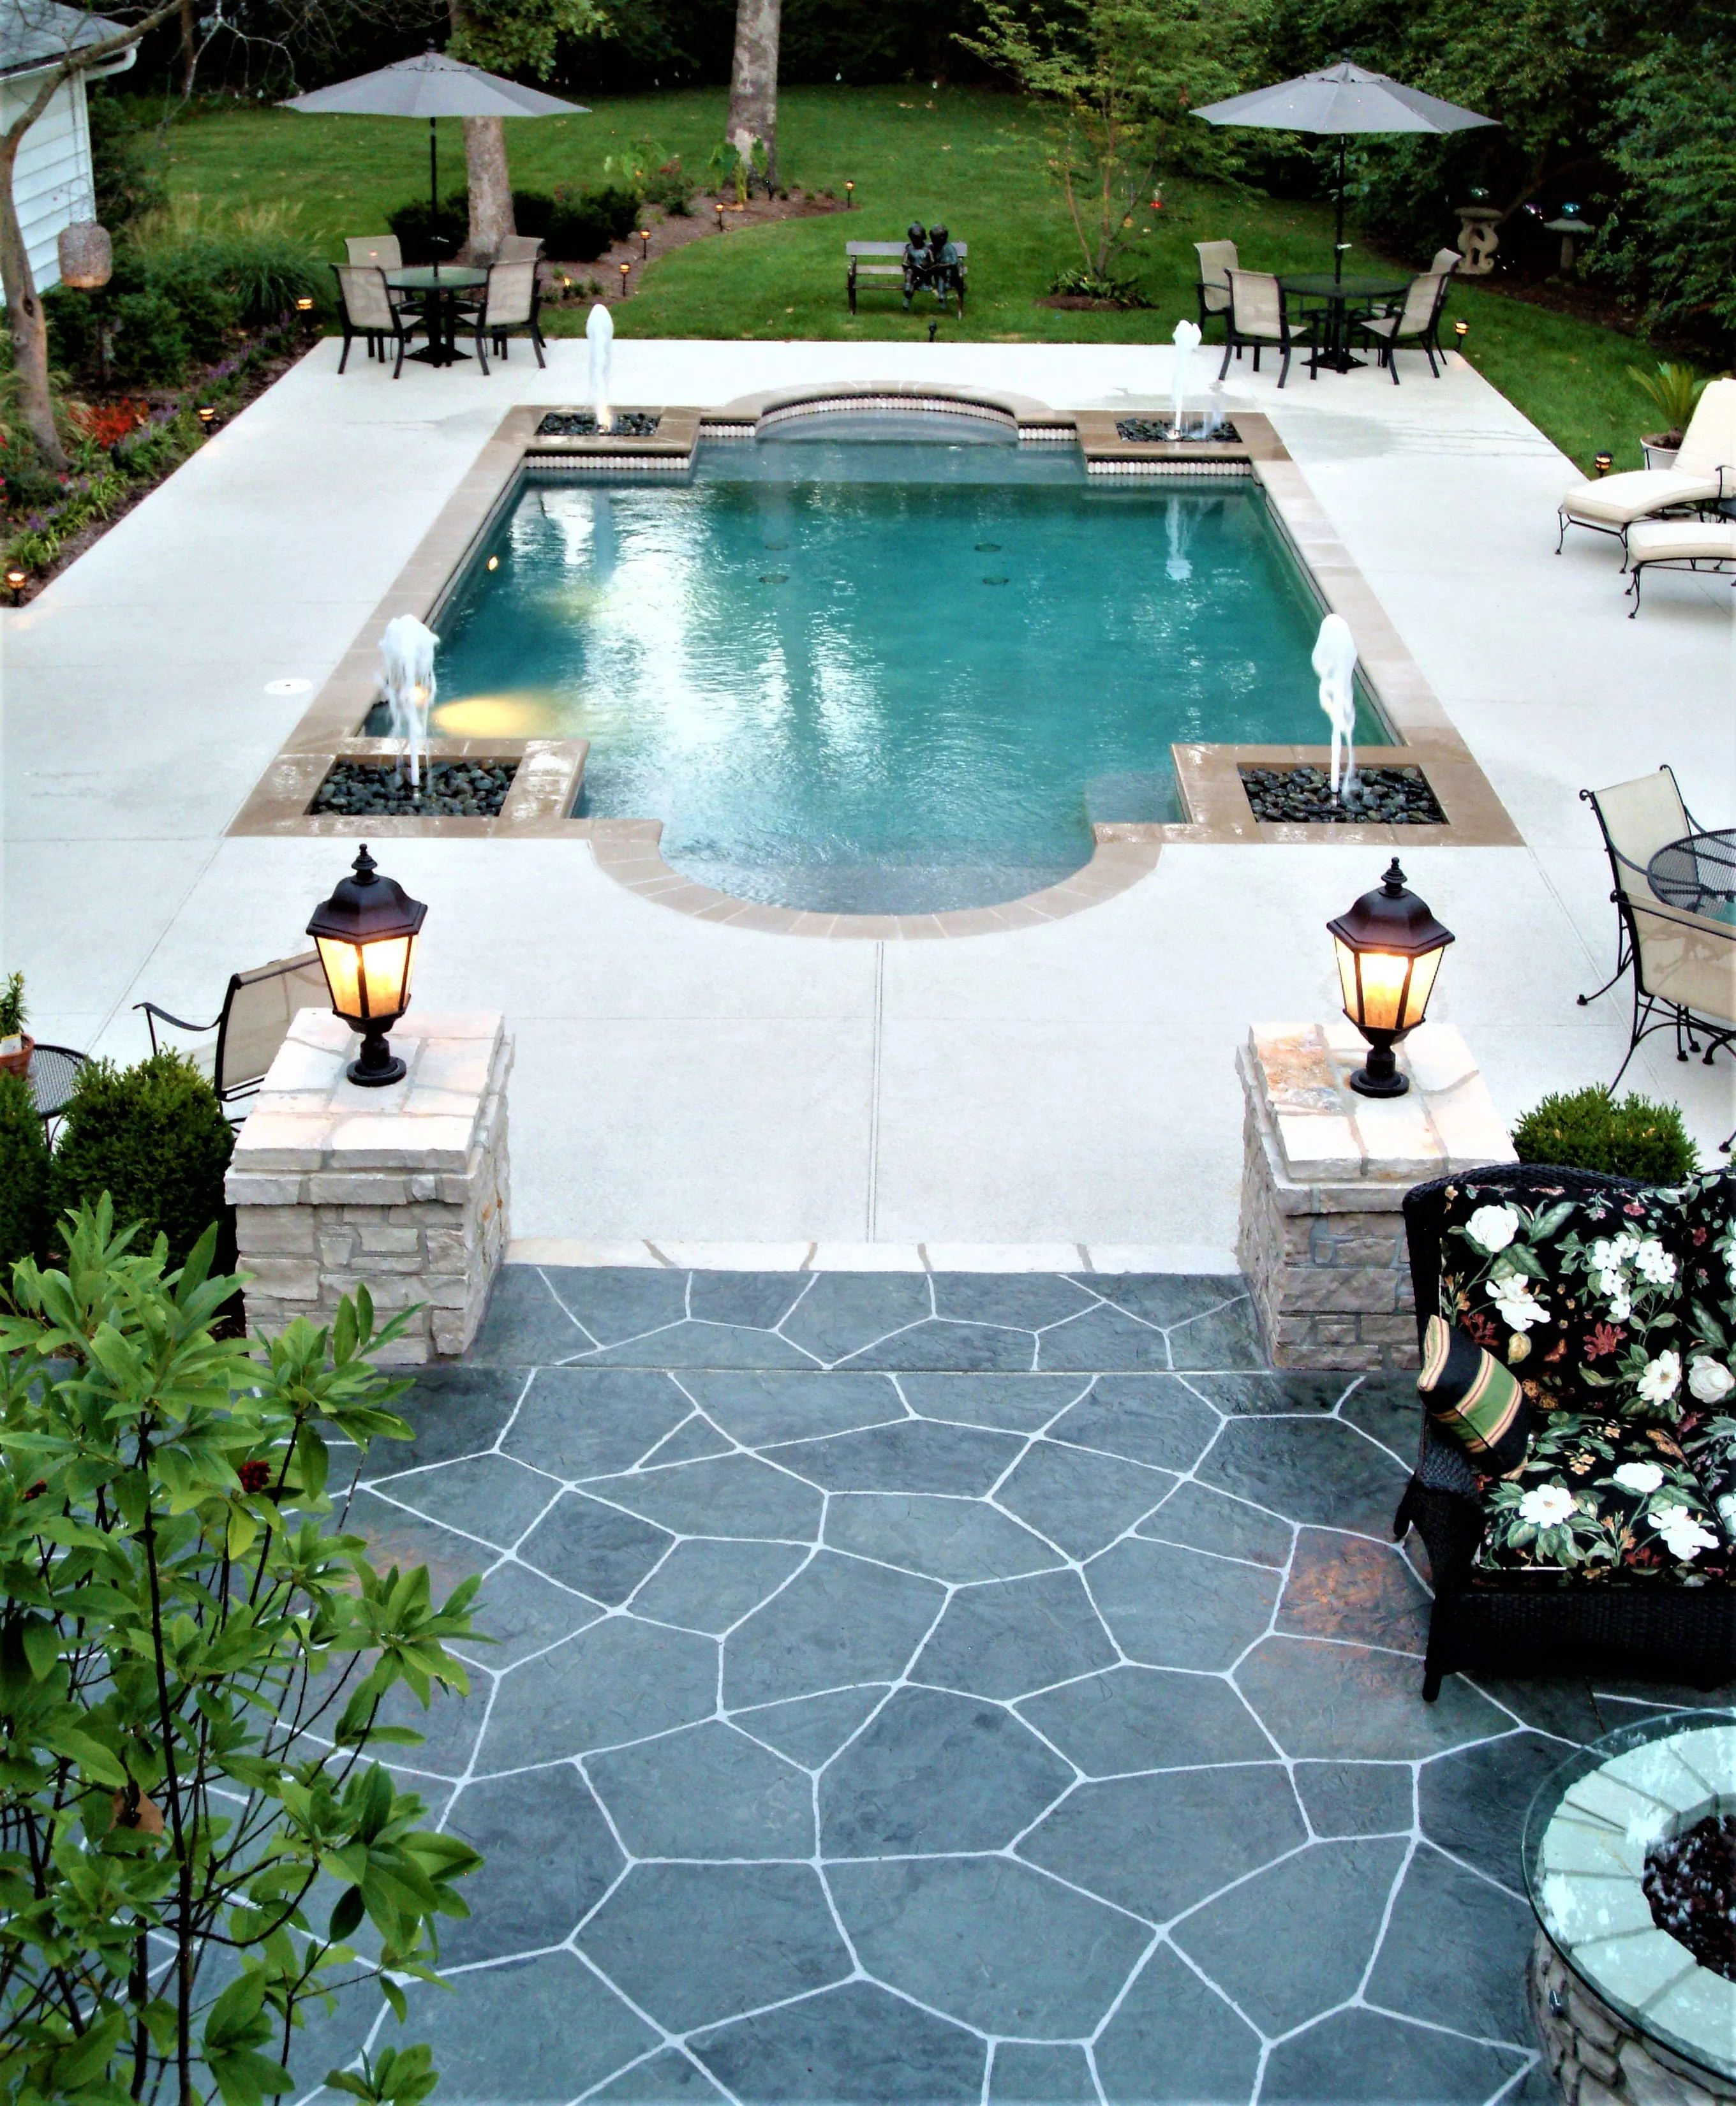 Pool Deck Ideas St Louis, MO | Decorative Concrete Resurfacing on Pool Deck Patio Ideas  id=92863